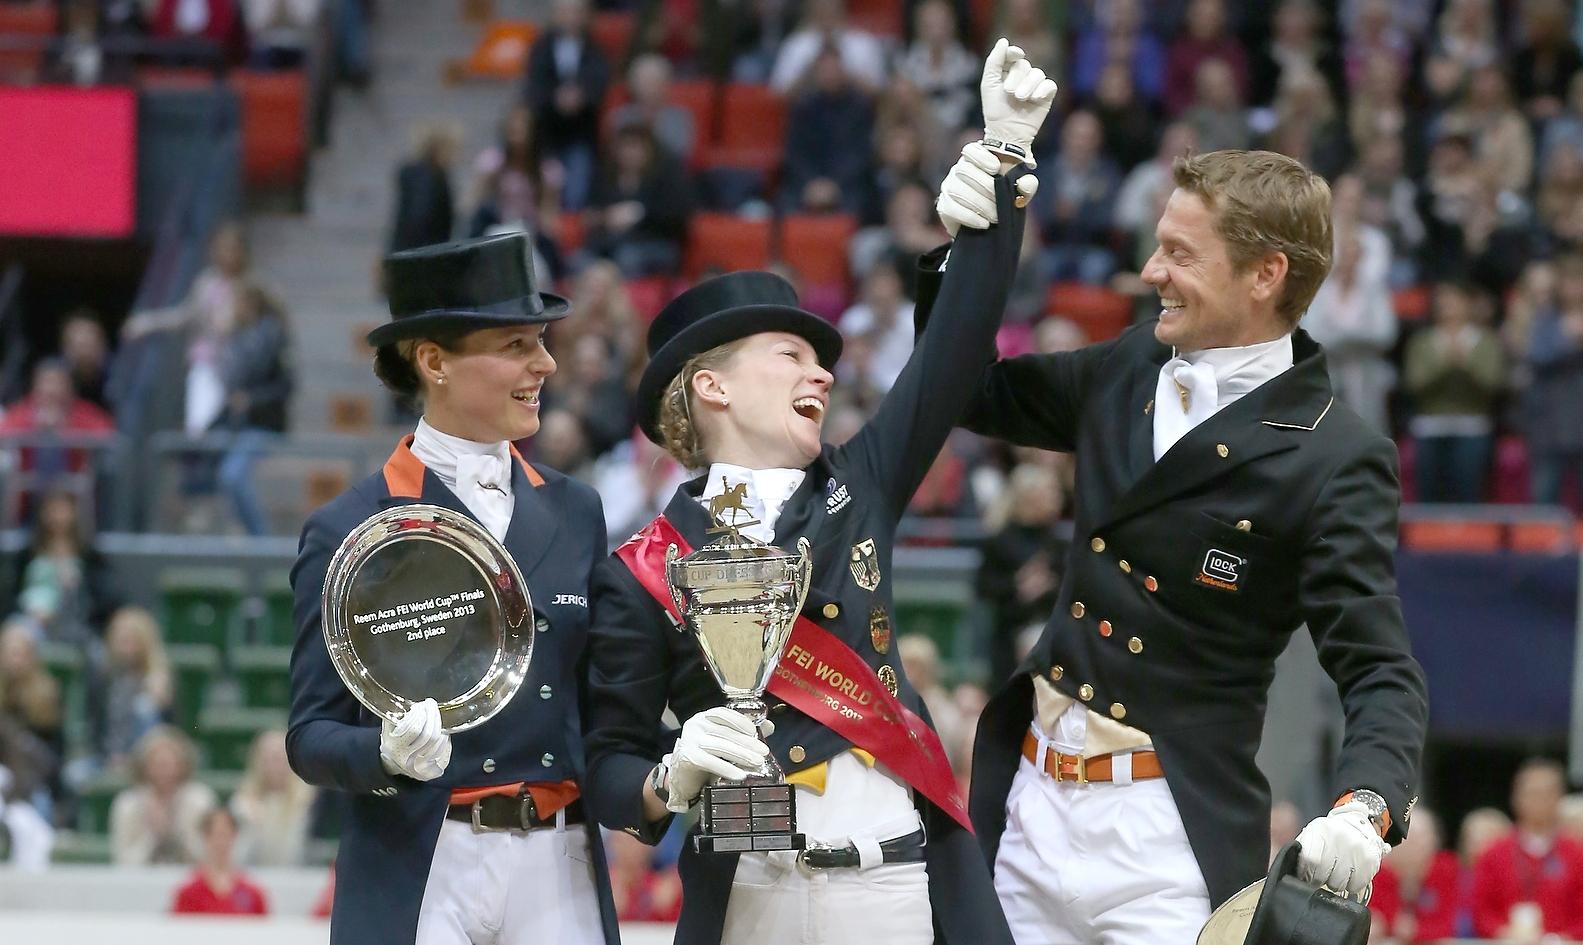 finale wereldbeker dressuur Adelinde Cornelissen